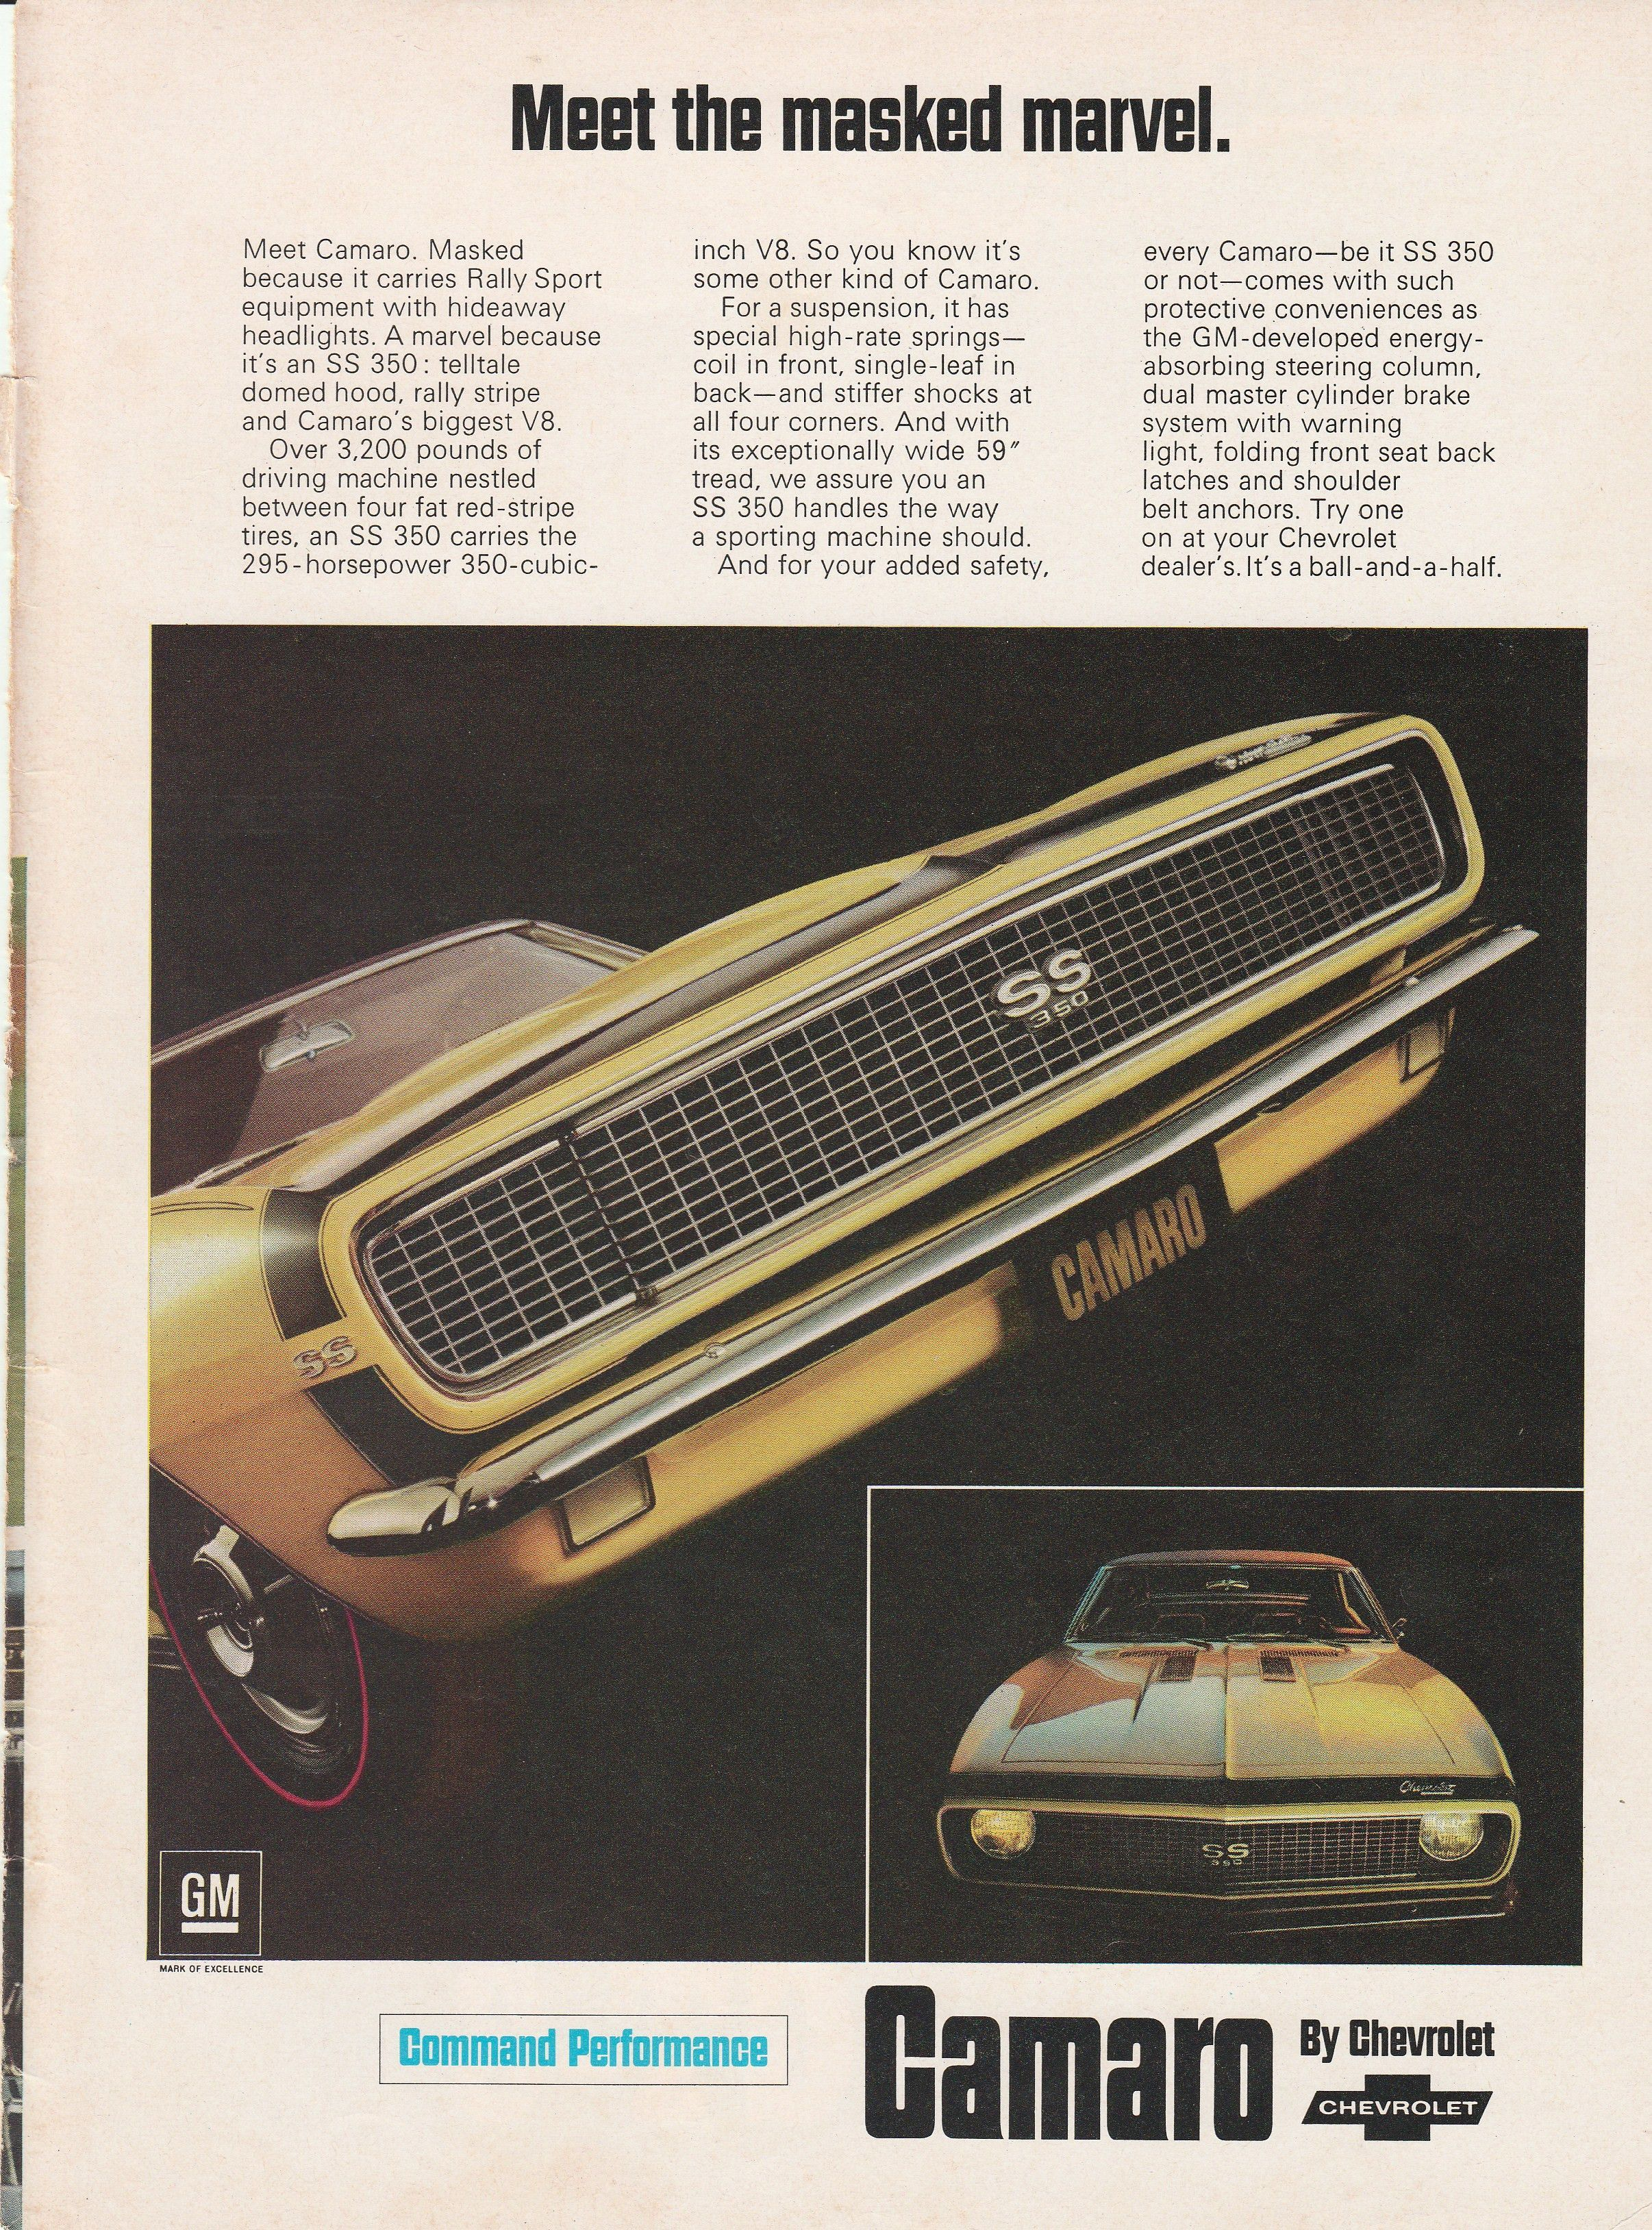 1967 Chevy Camaro Meet the masked marvel vintage ad